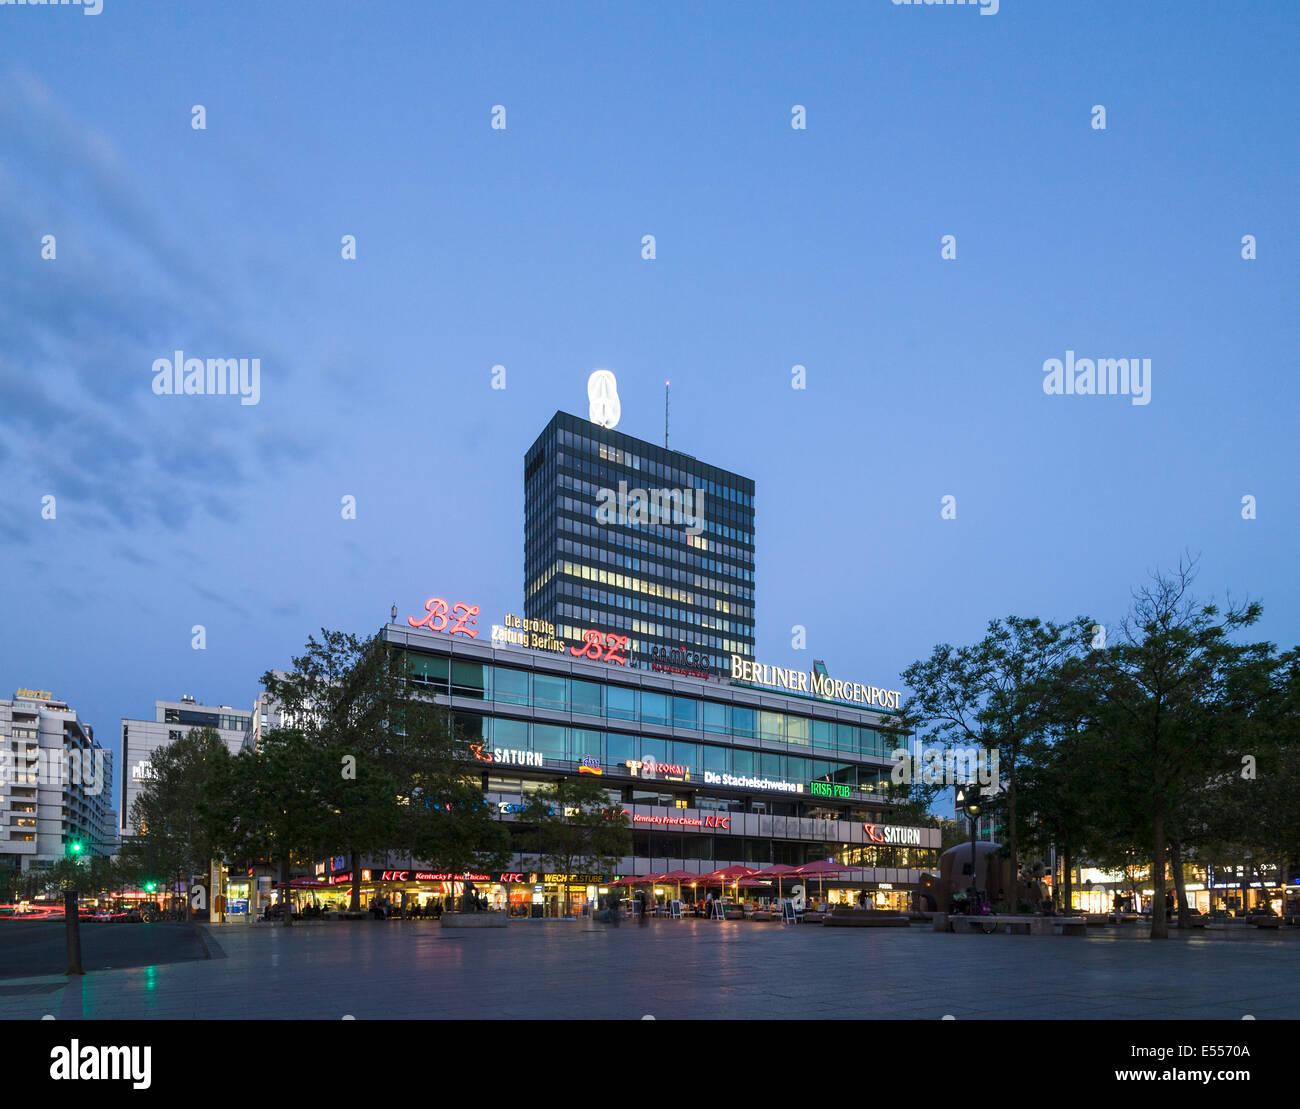 Europa Center, Berlin, Germany - Stock Image